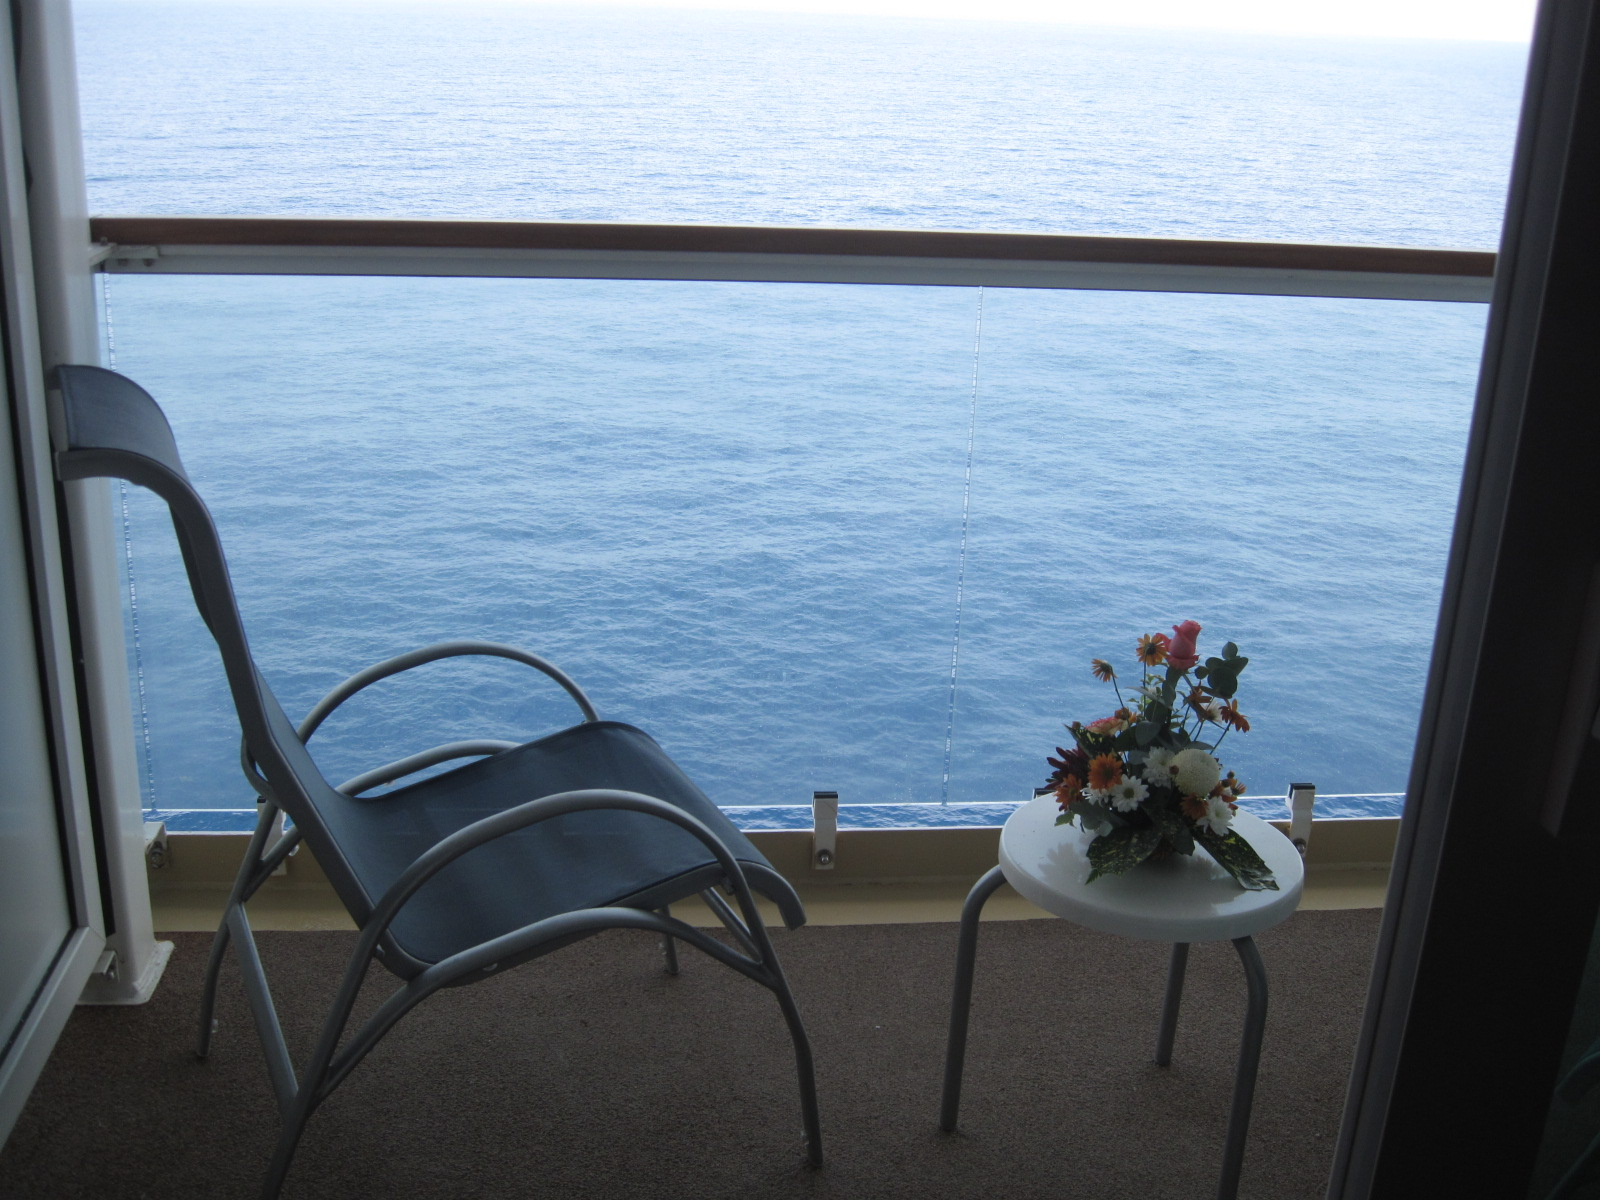 07/11/2011 - Navigazione-img_0609-jpg